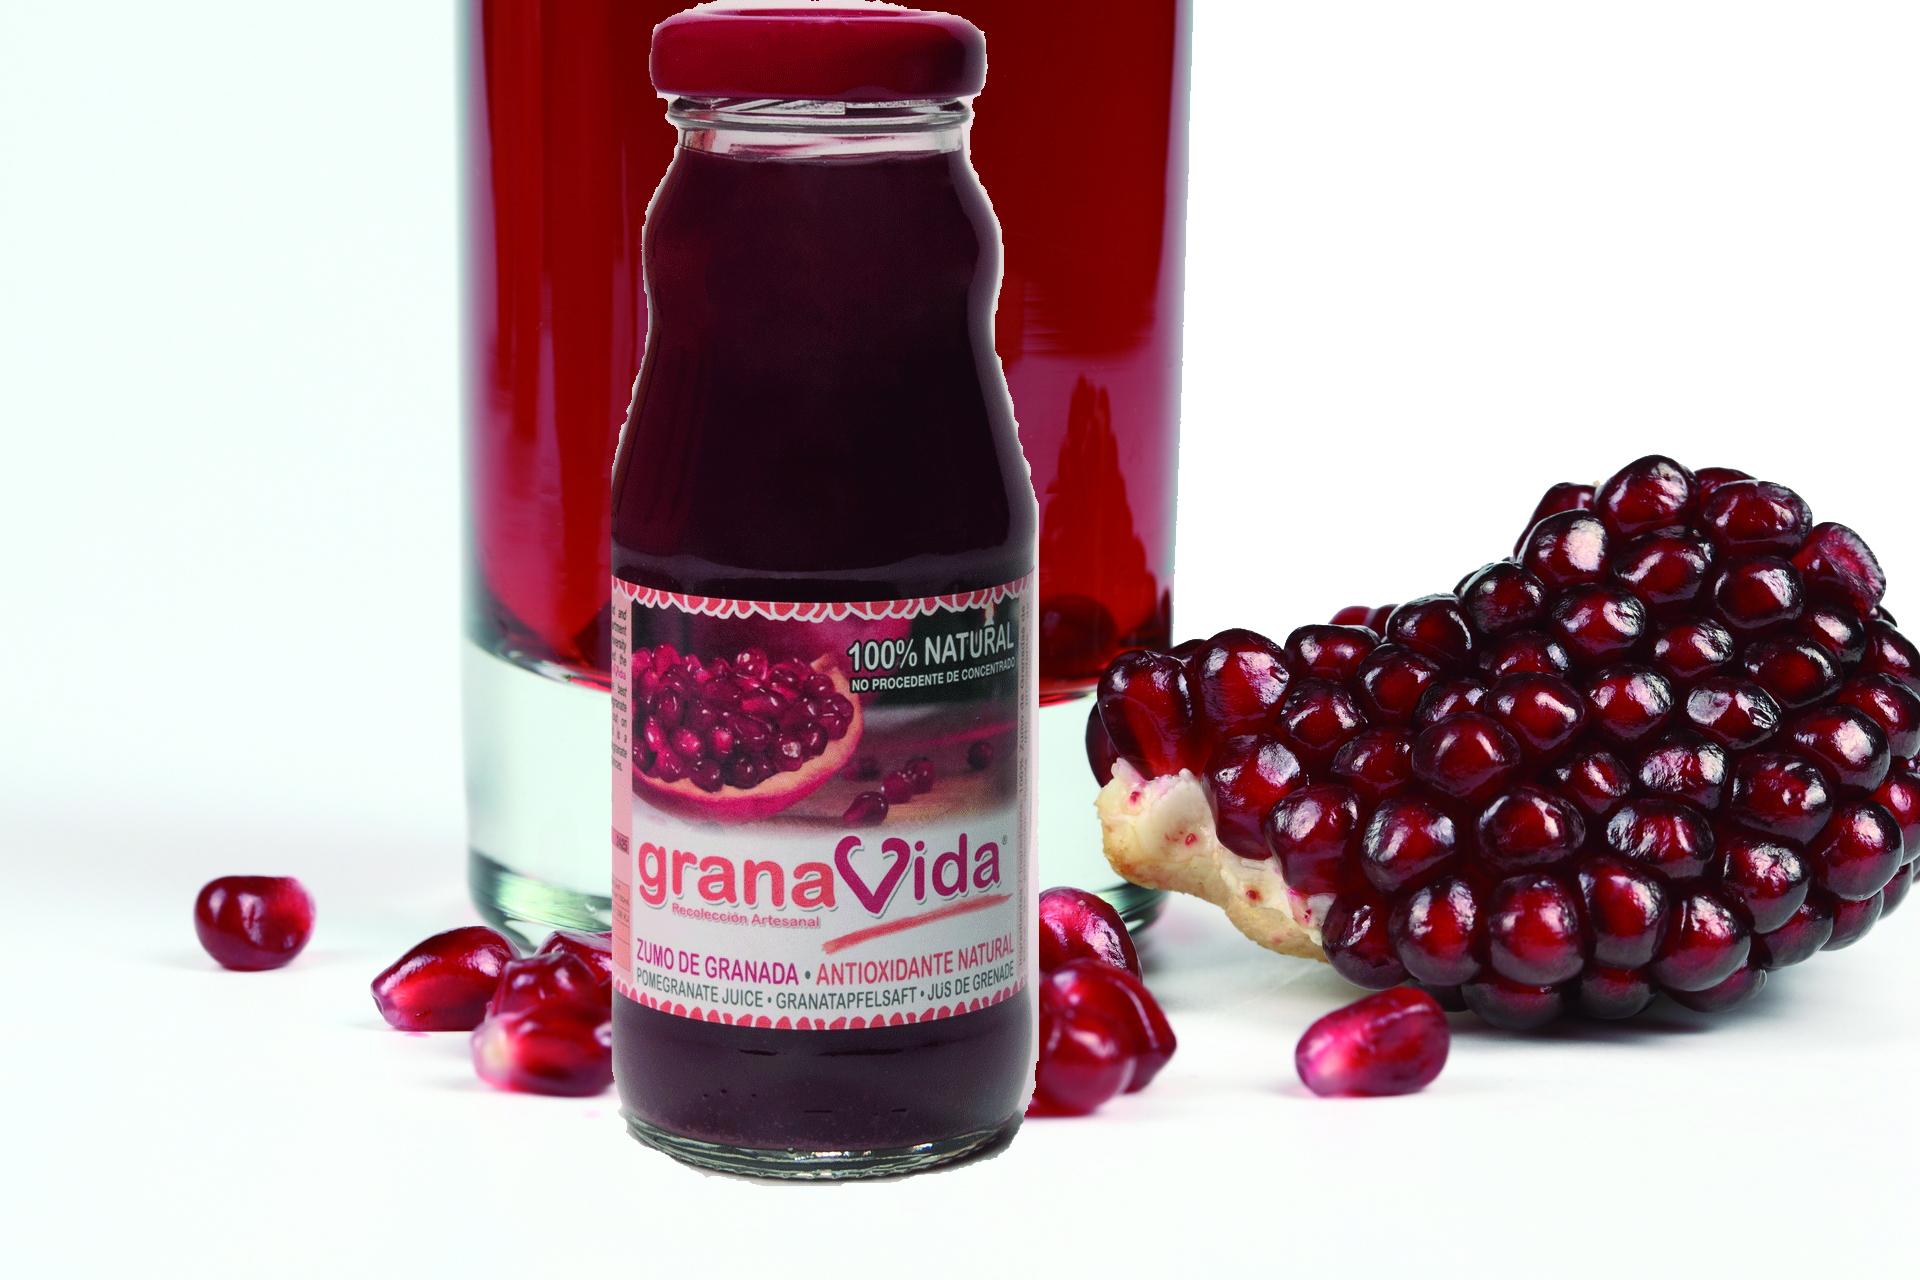 zumo de granada granavida